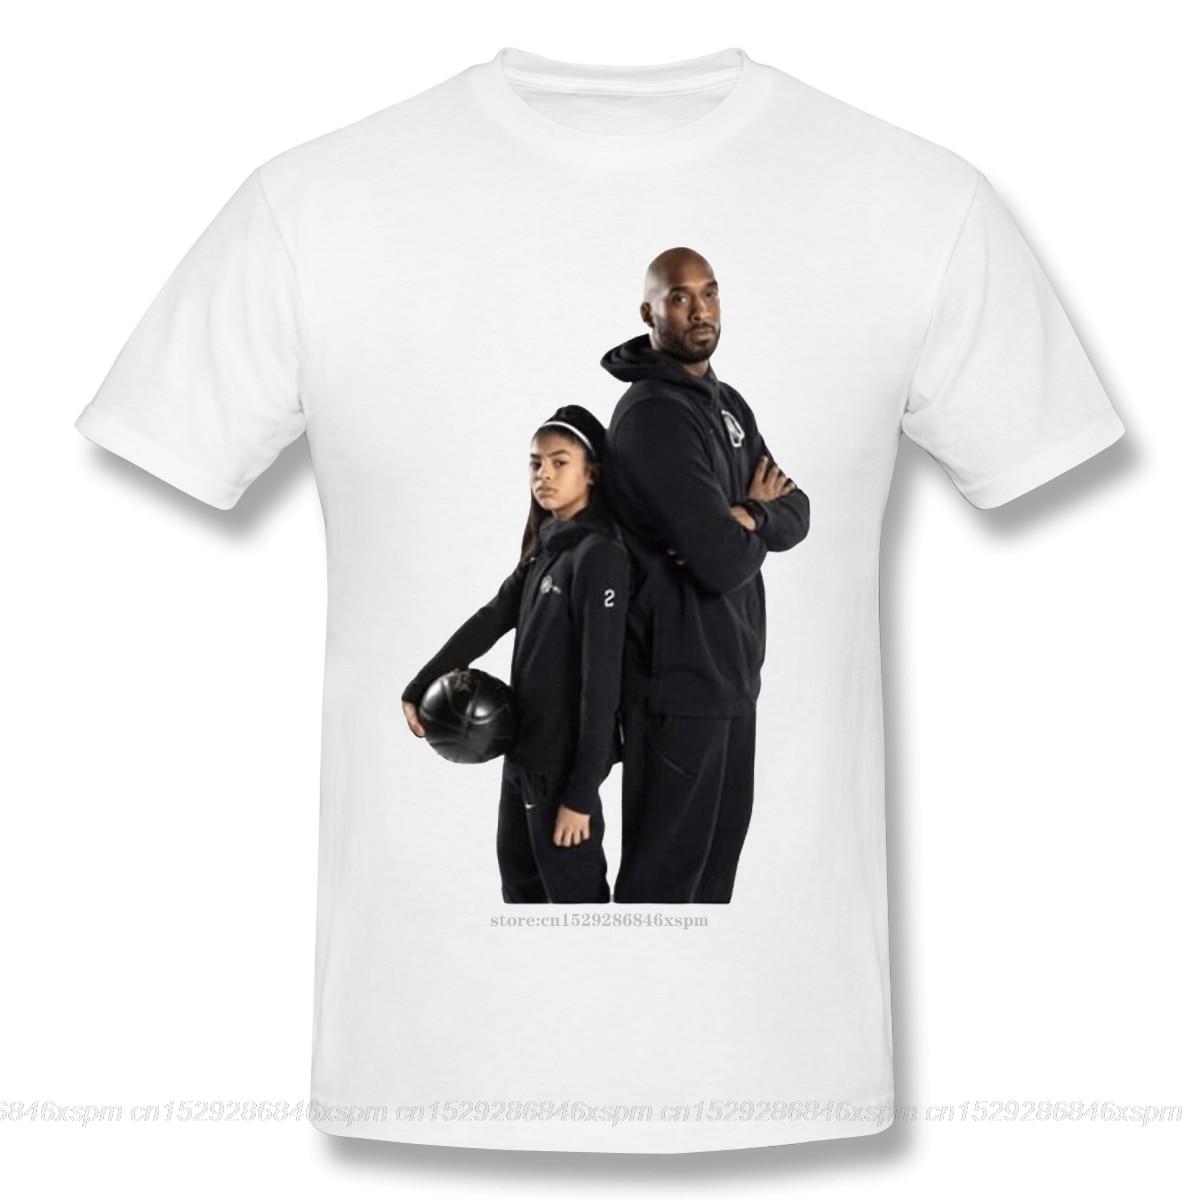 Men bryant T-Shirts Funny Round Neck Short Sleeve Tops Gigi Pure Cotton Tees Funny Harajuku tShirt(China)